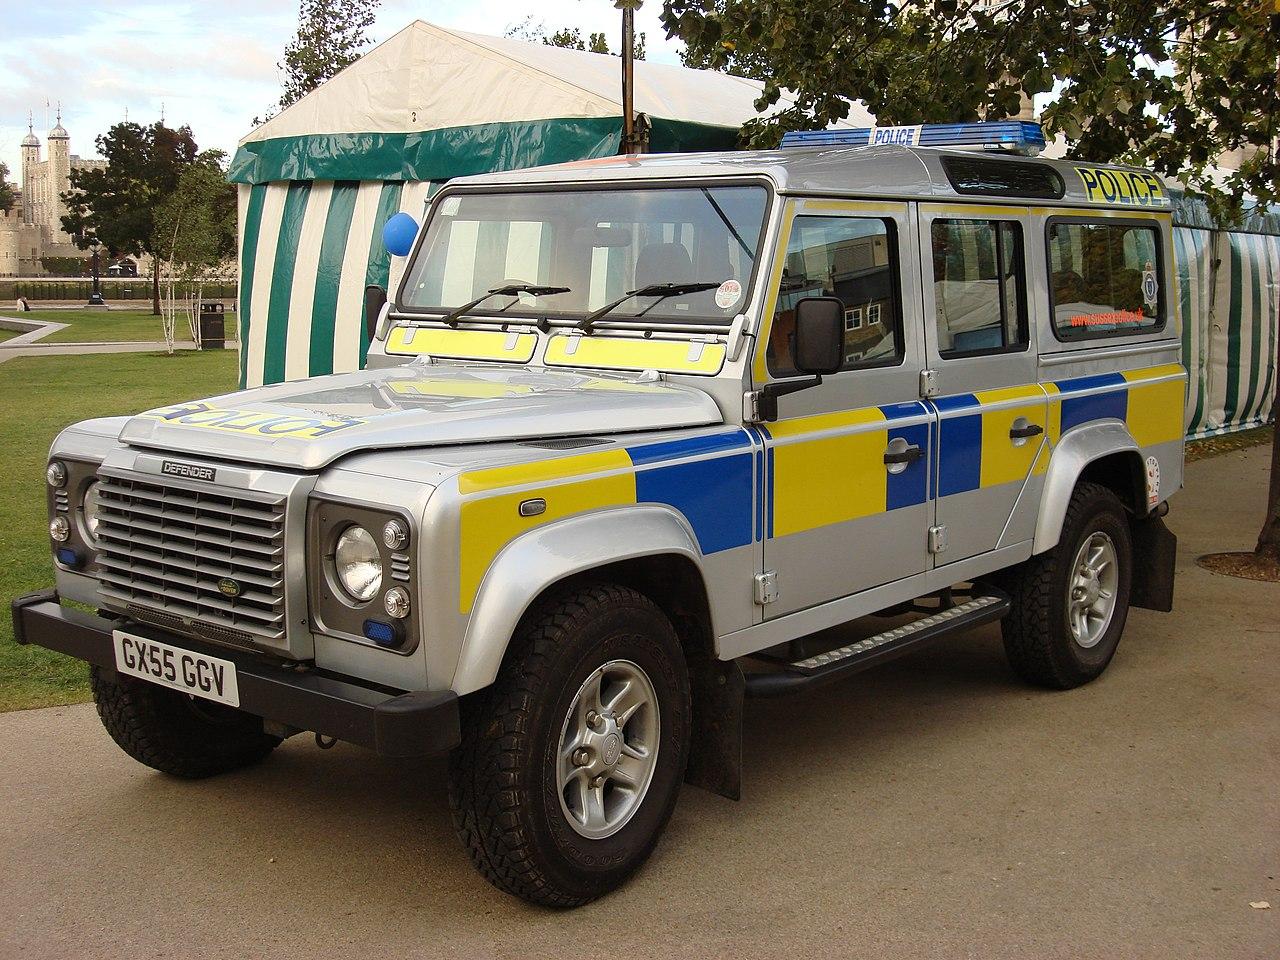 Dorset Classic Car Auctions Uk